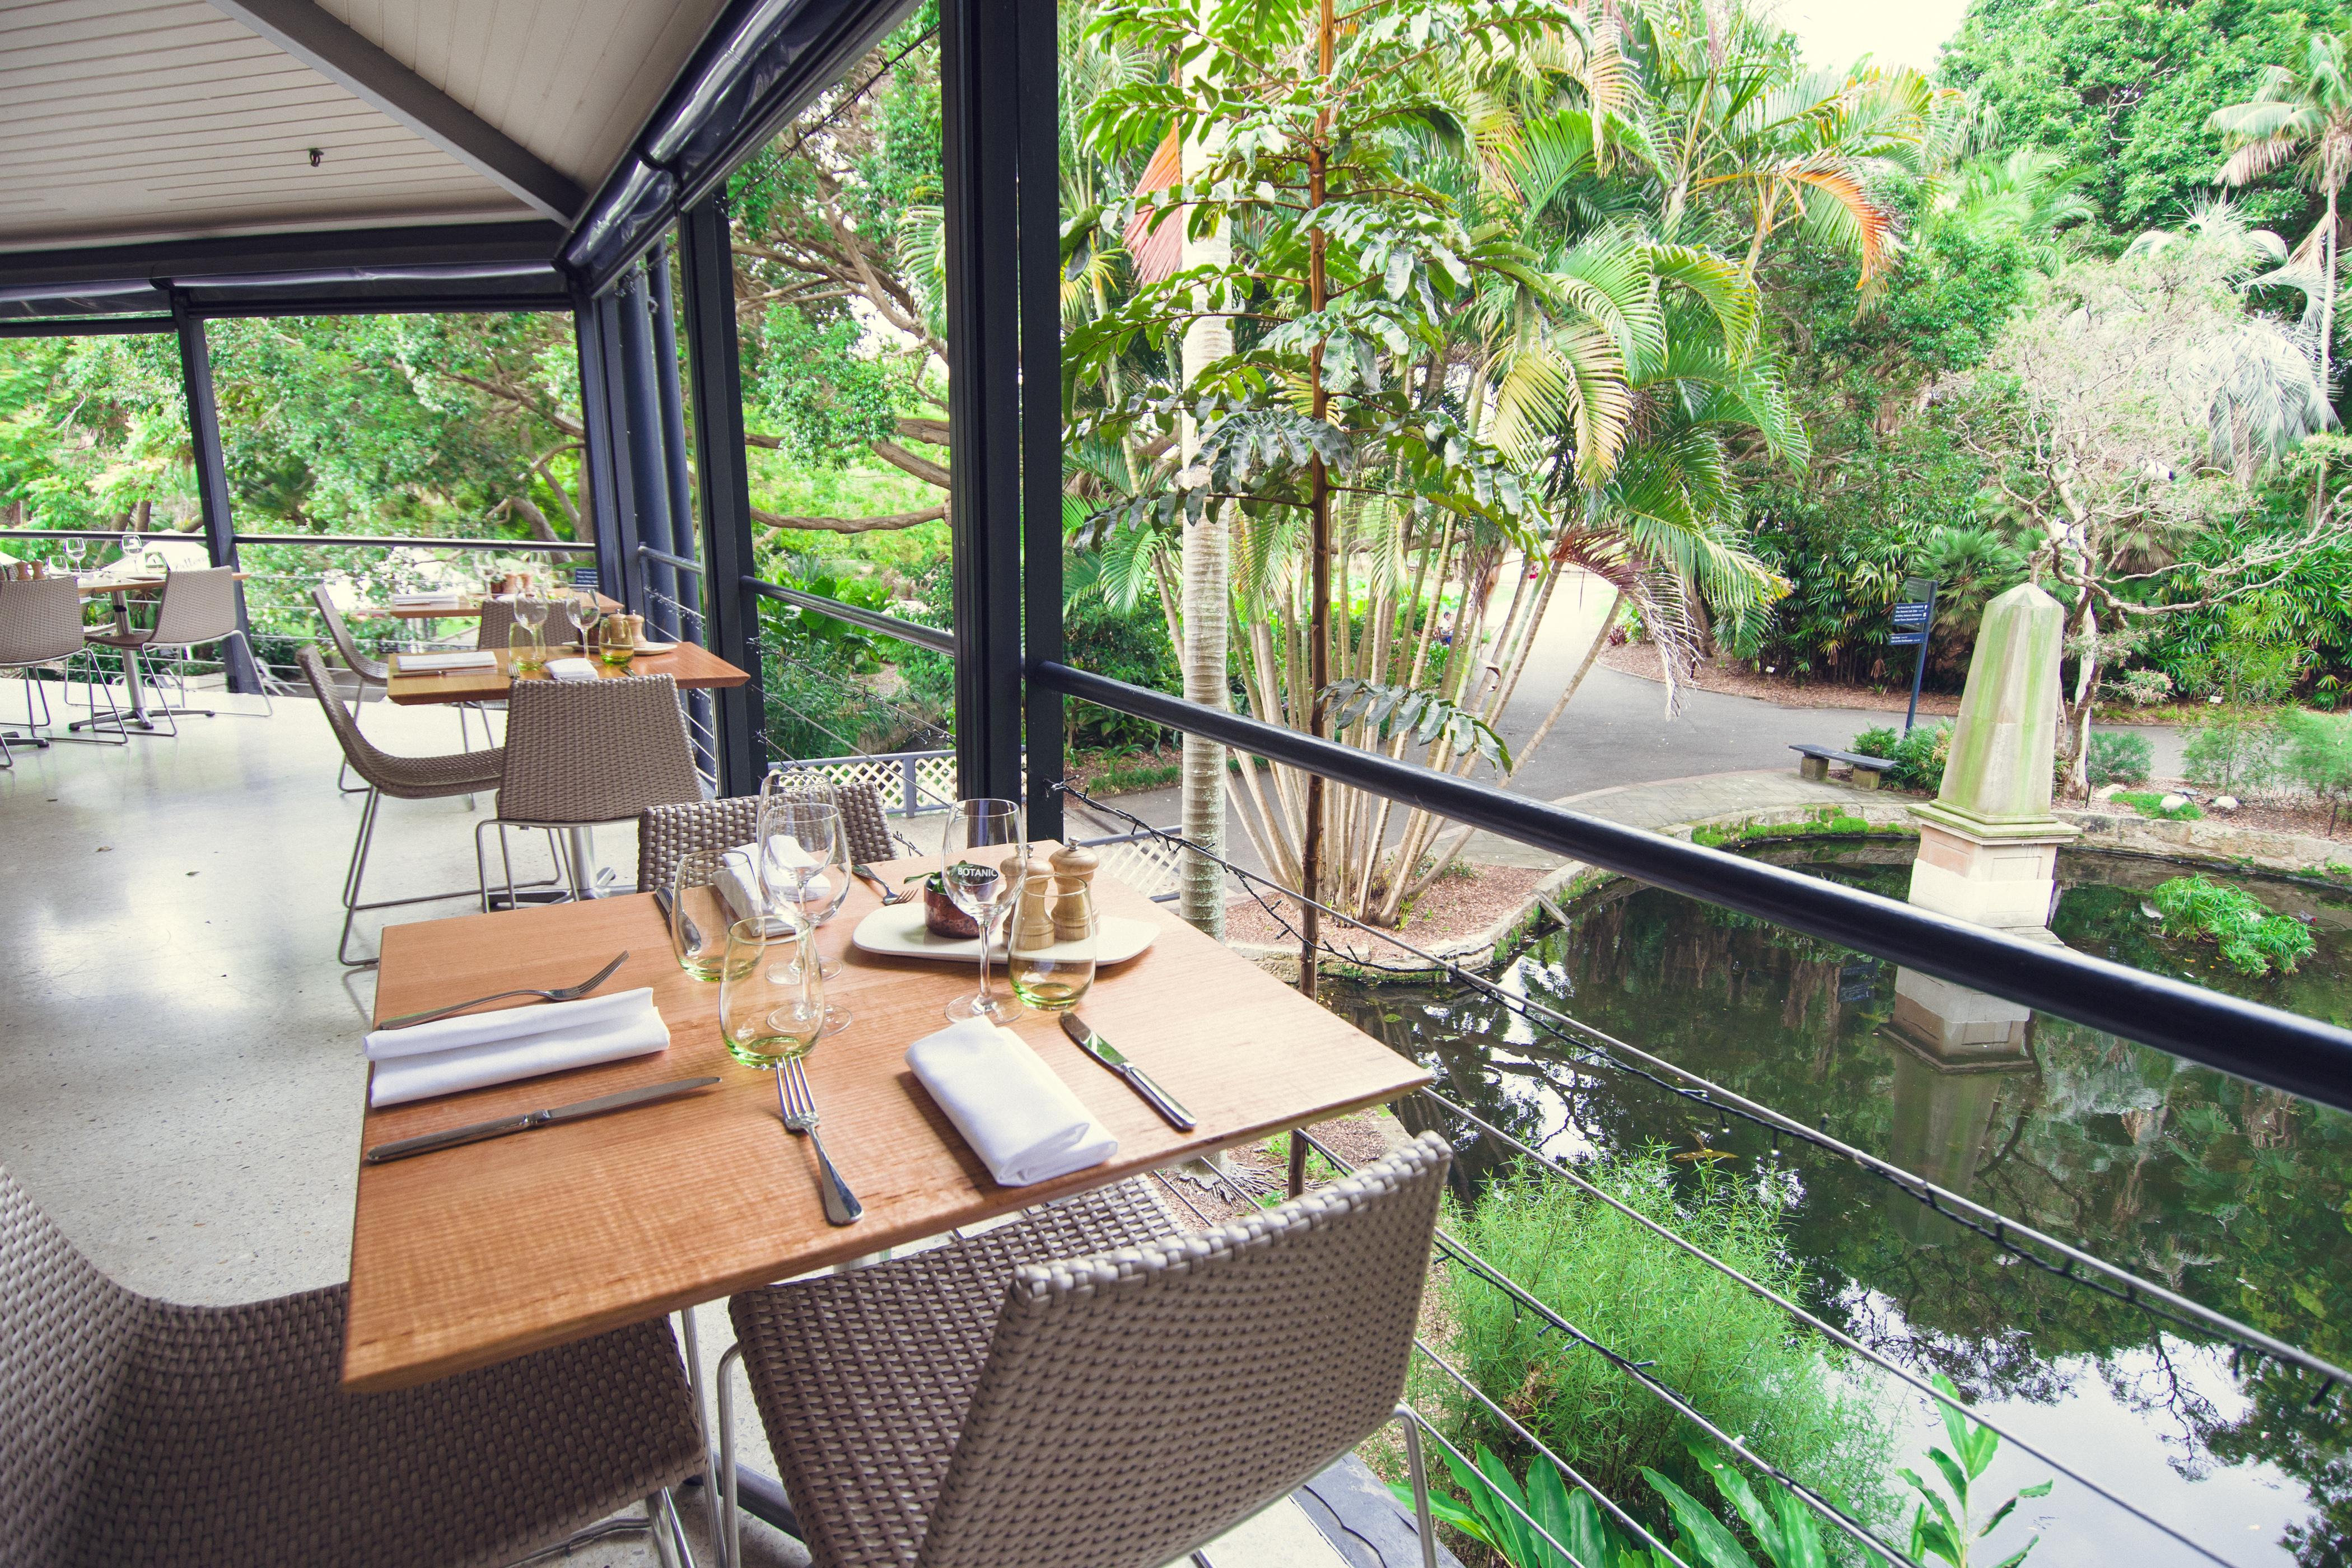 Event advisers for Au jardin restaurant botanic gardens